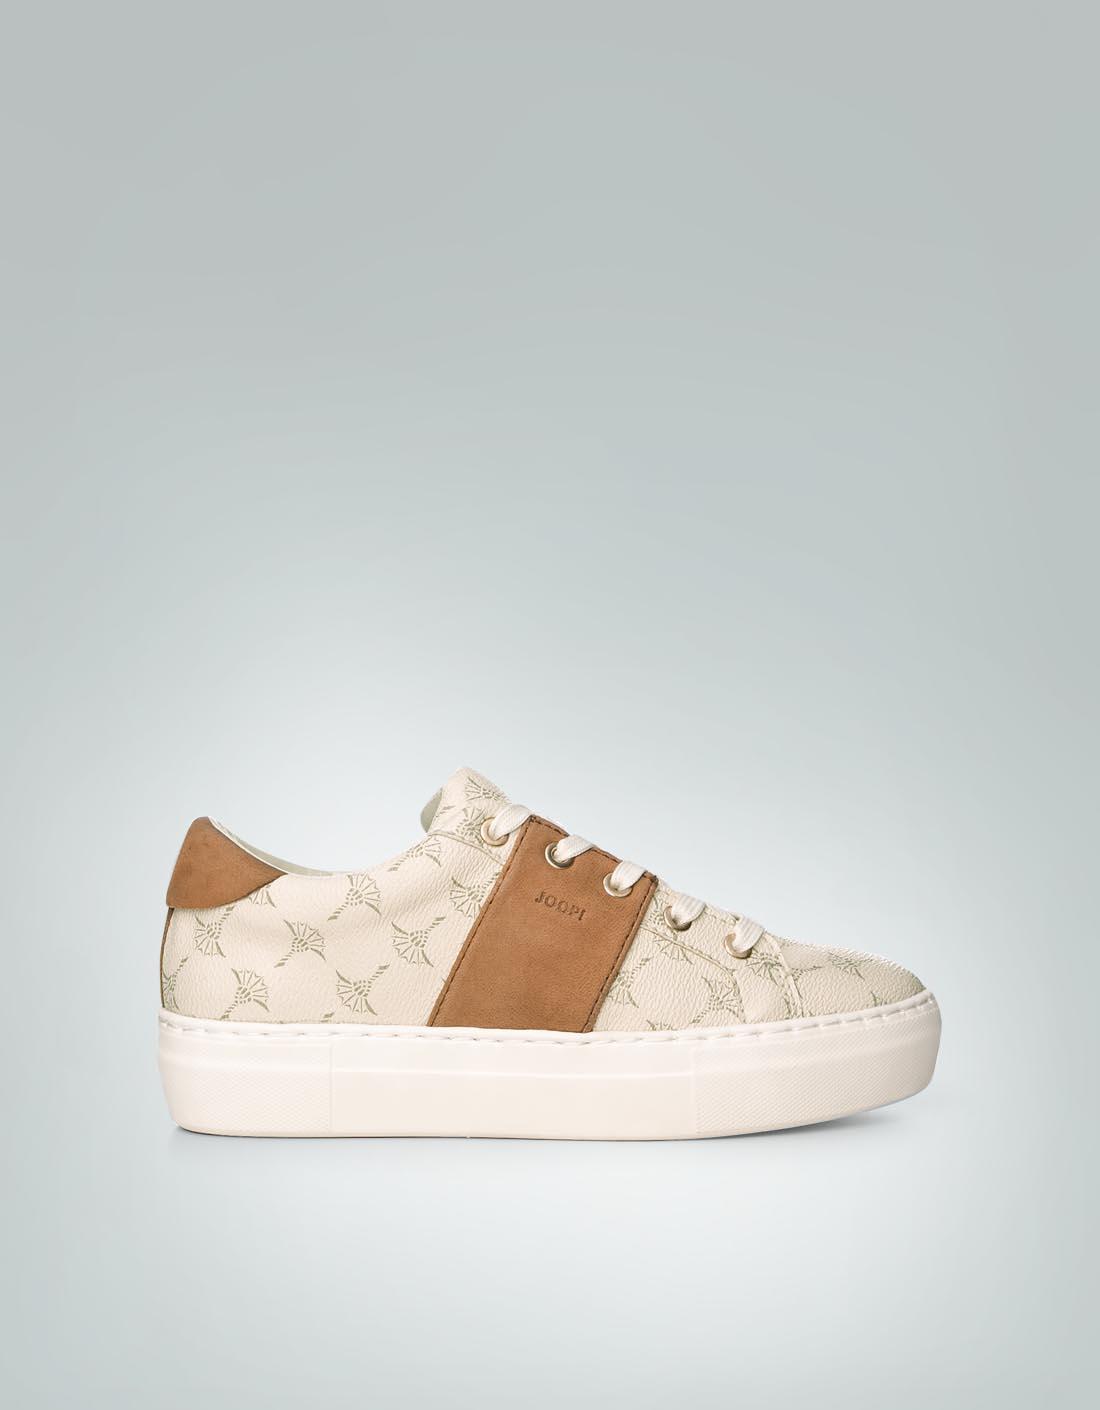 JOOP Damen Schuhe Sneaker im Allover-Dessin beige 5WnwUoB